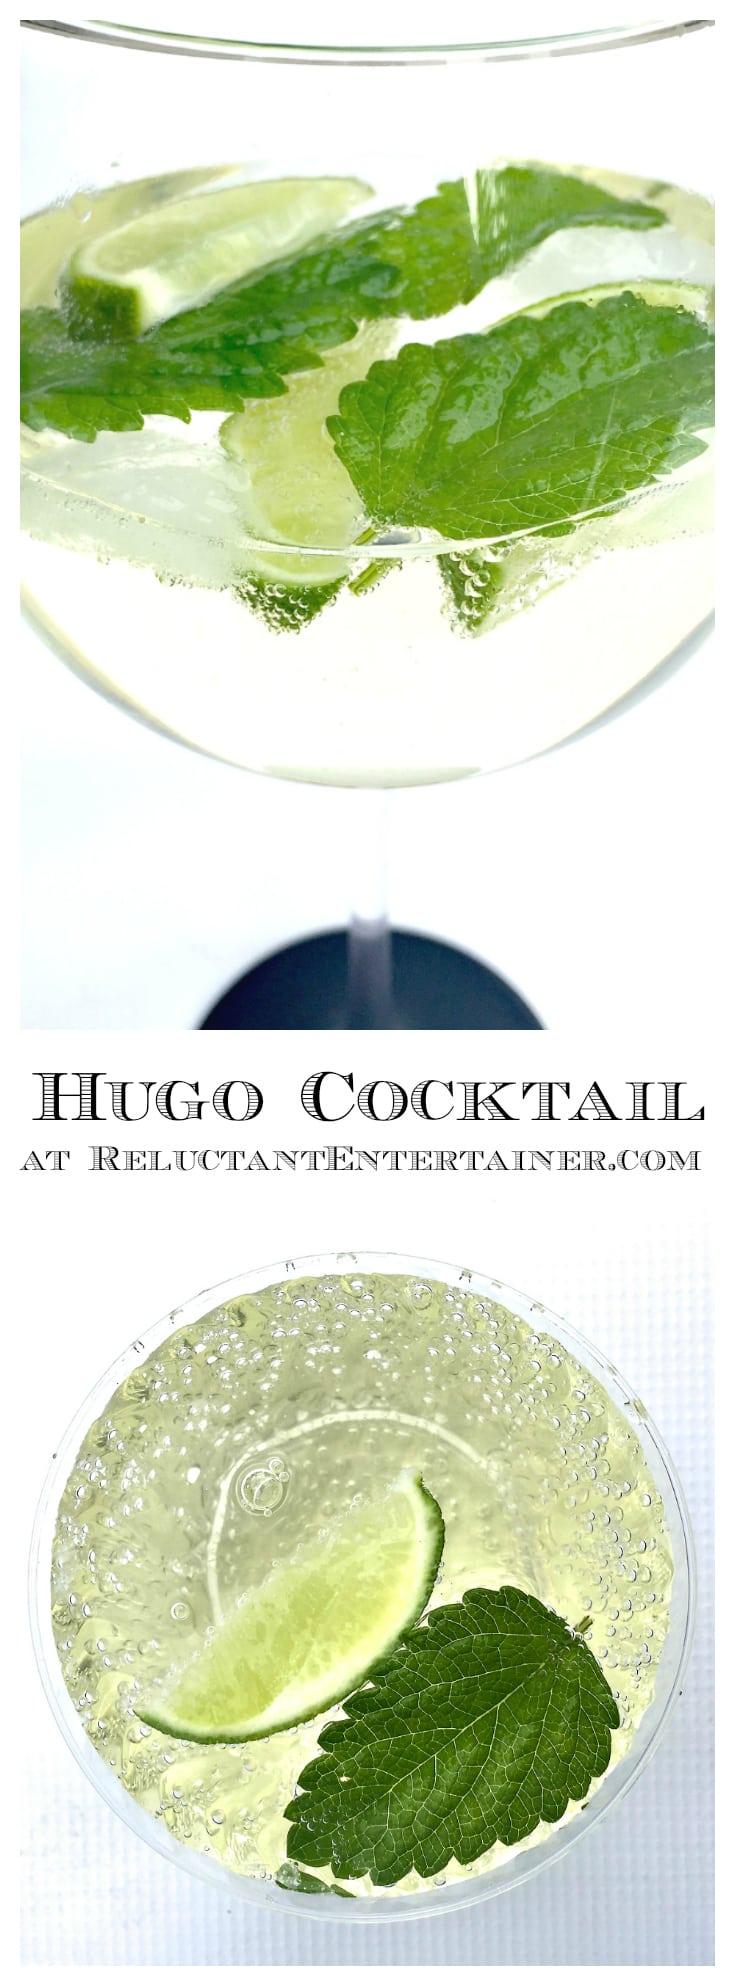 Hugo Cocktail Recipe - the perfect celebration drink!